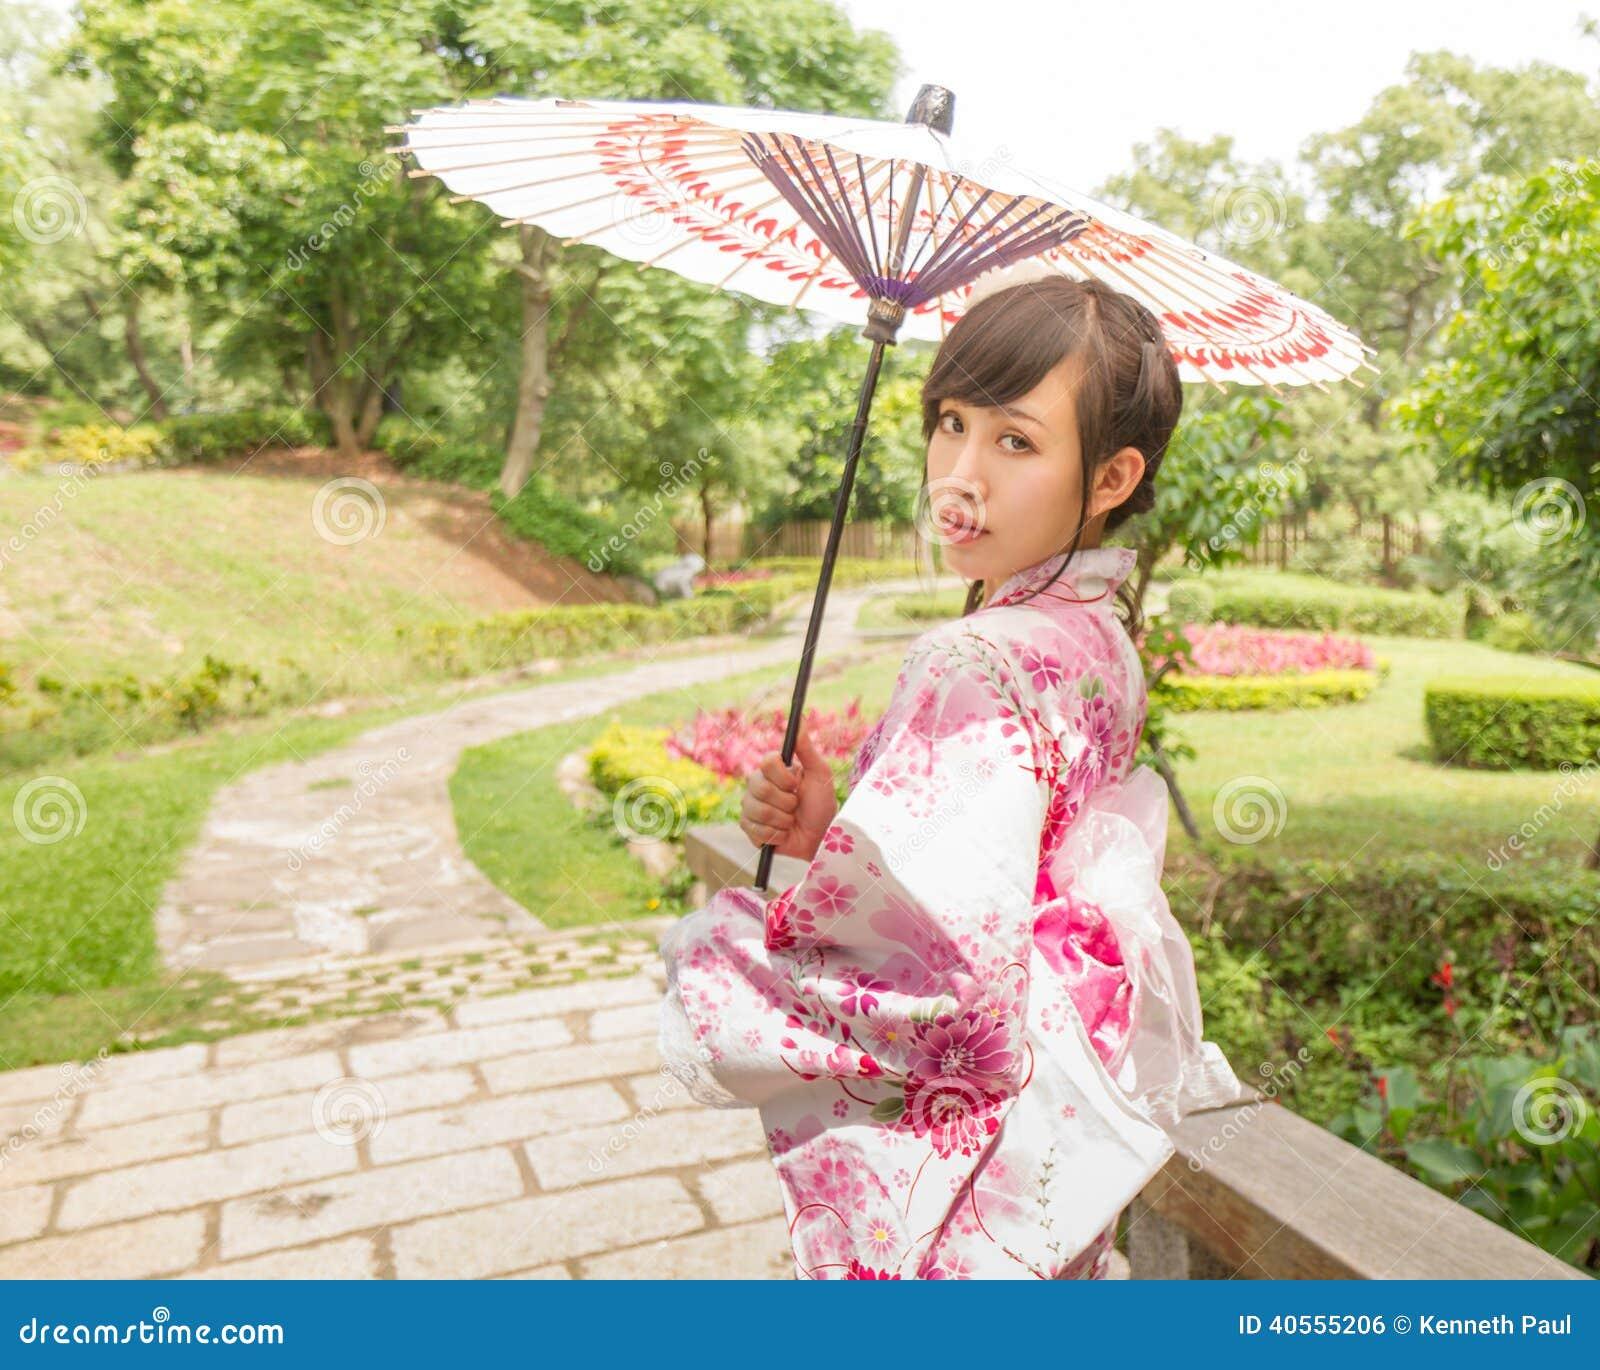 12f26c1e1 Asian Woman Wearing A Yukata And Holding An Umbrella In Japanese ...